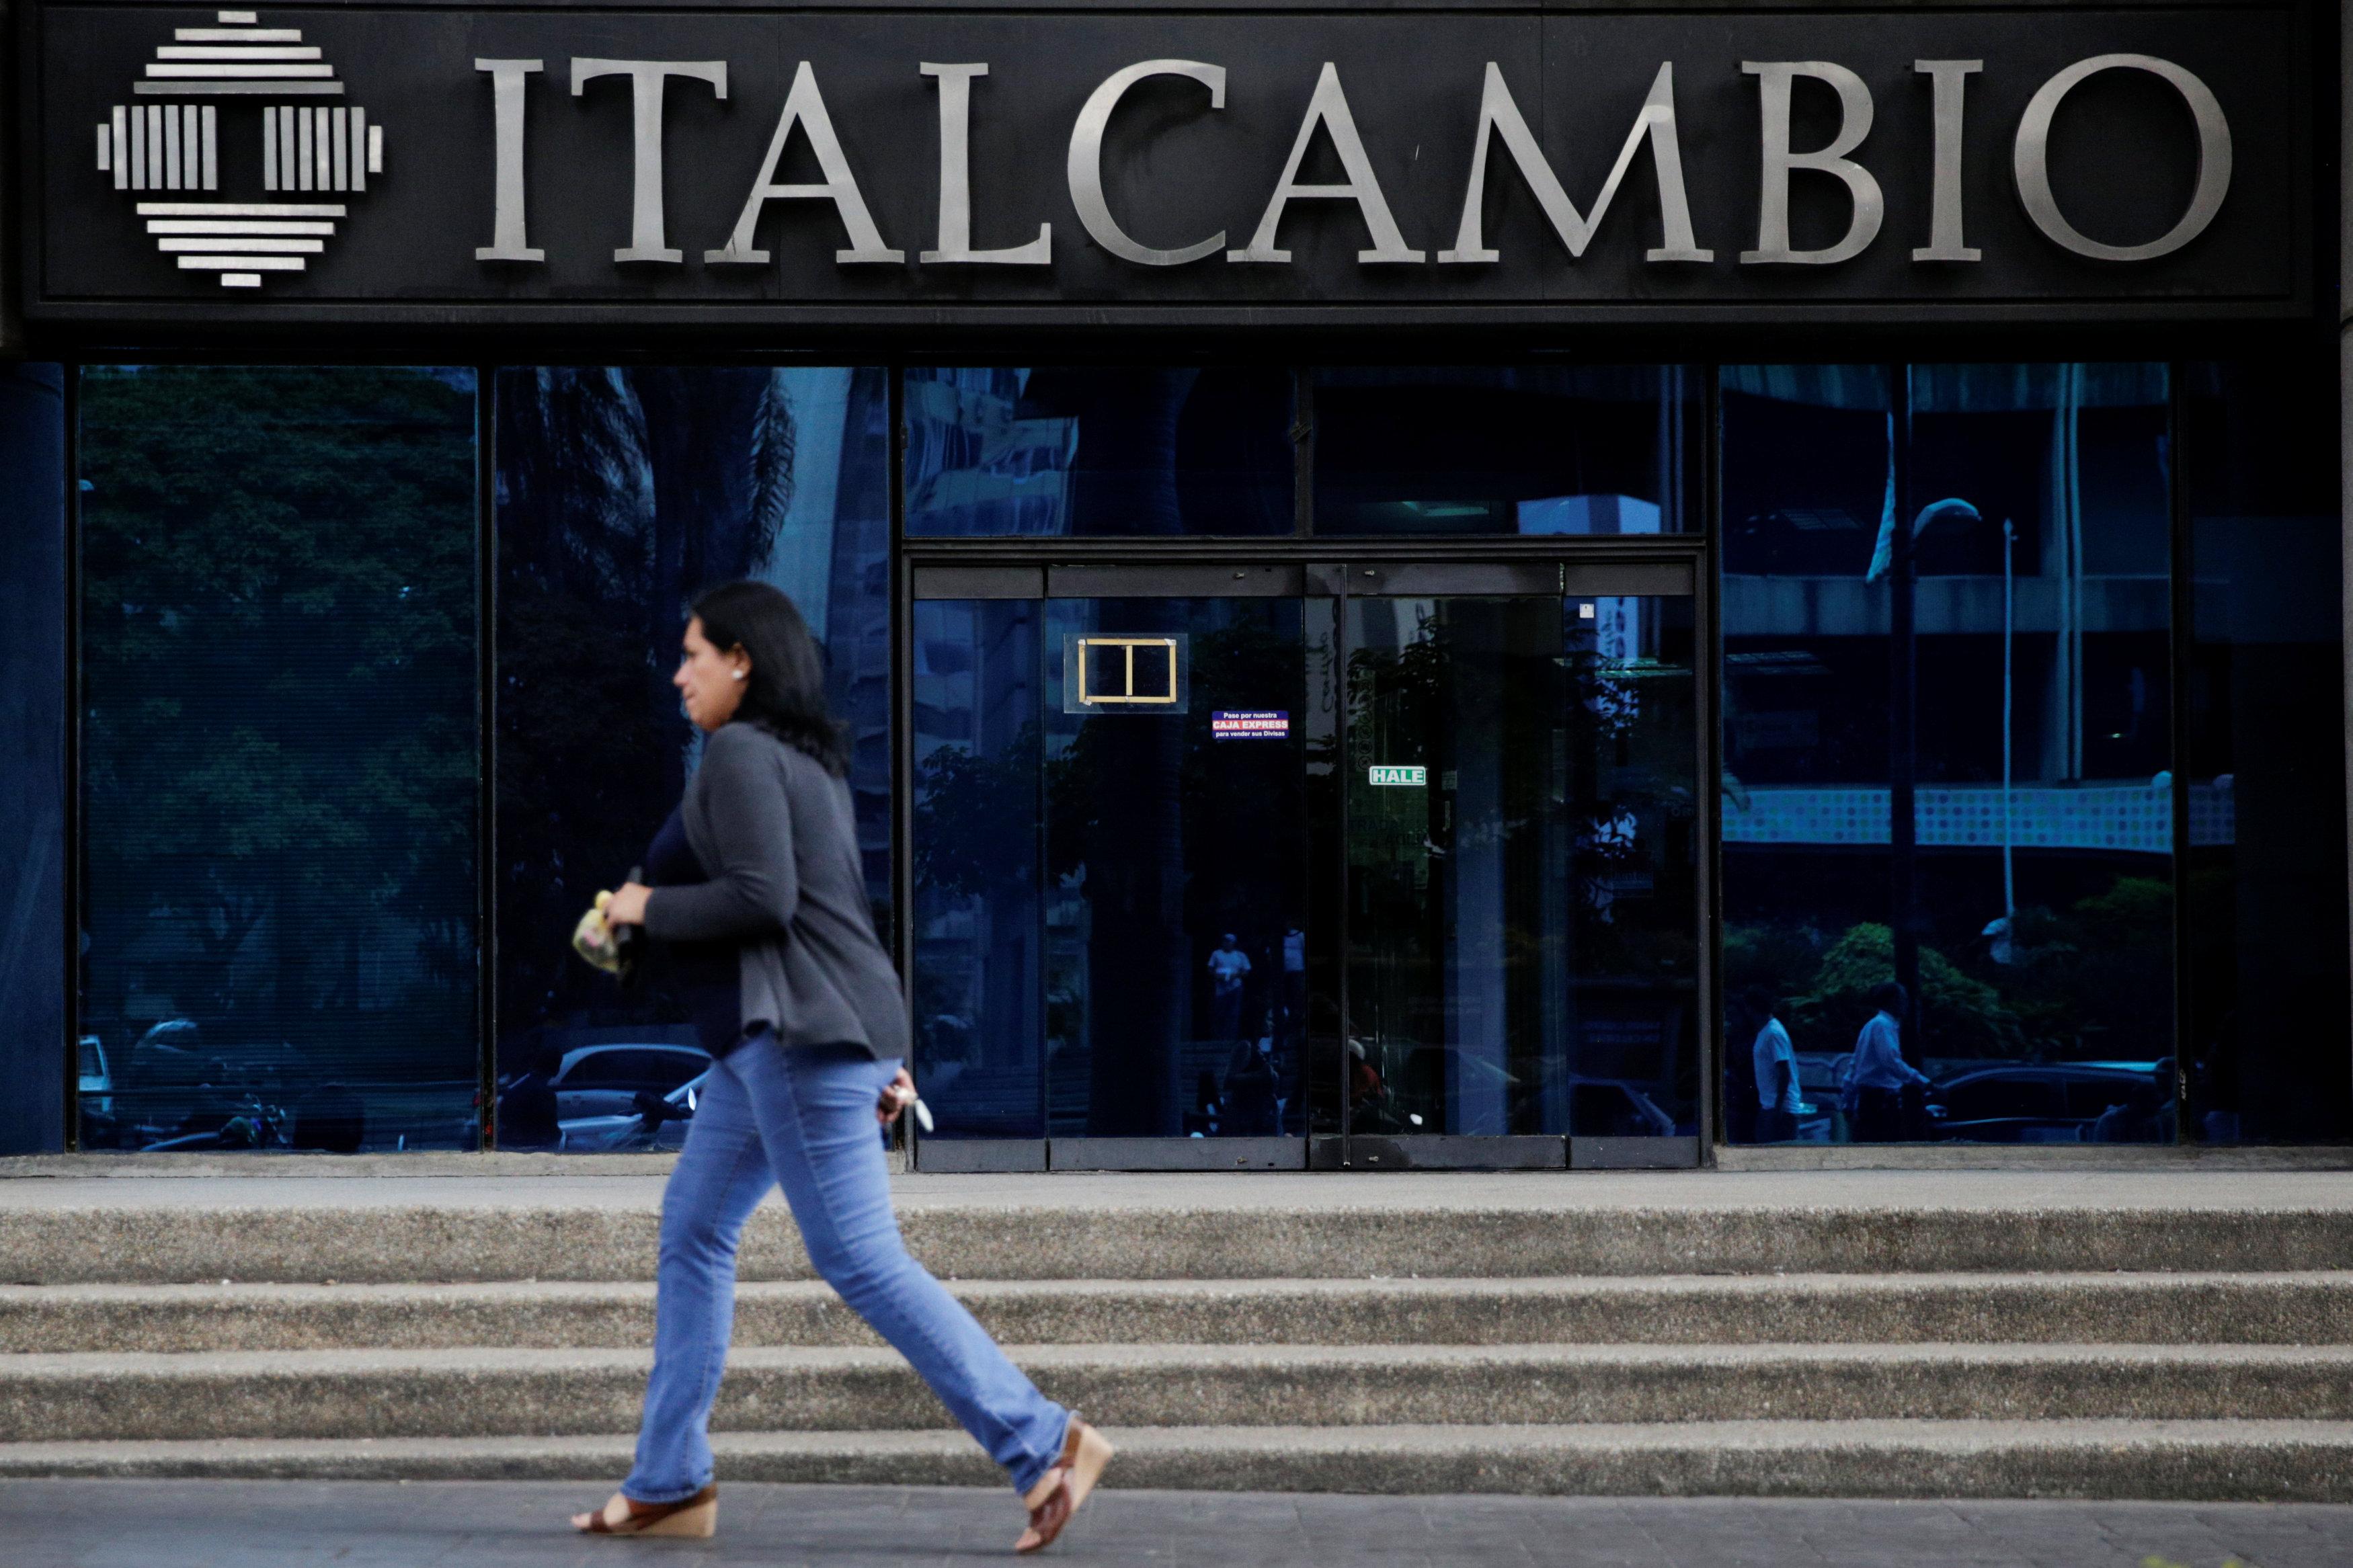 A woman walks past a branch of Italcambio currency exchange in Caracas, Venezuela on Feb. 14, 2017.  (REUTERS/Marco Bello)